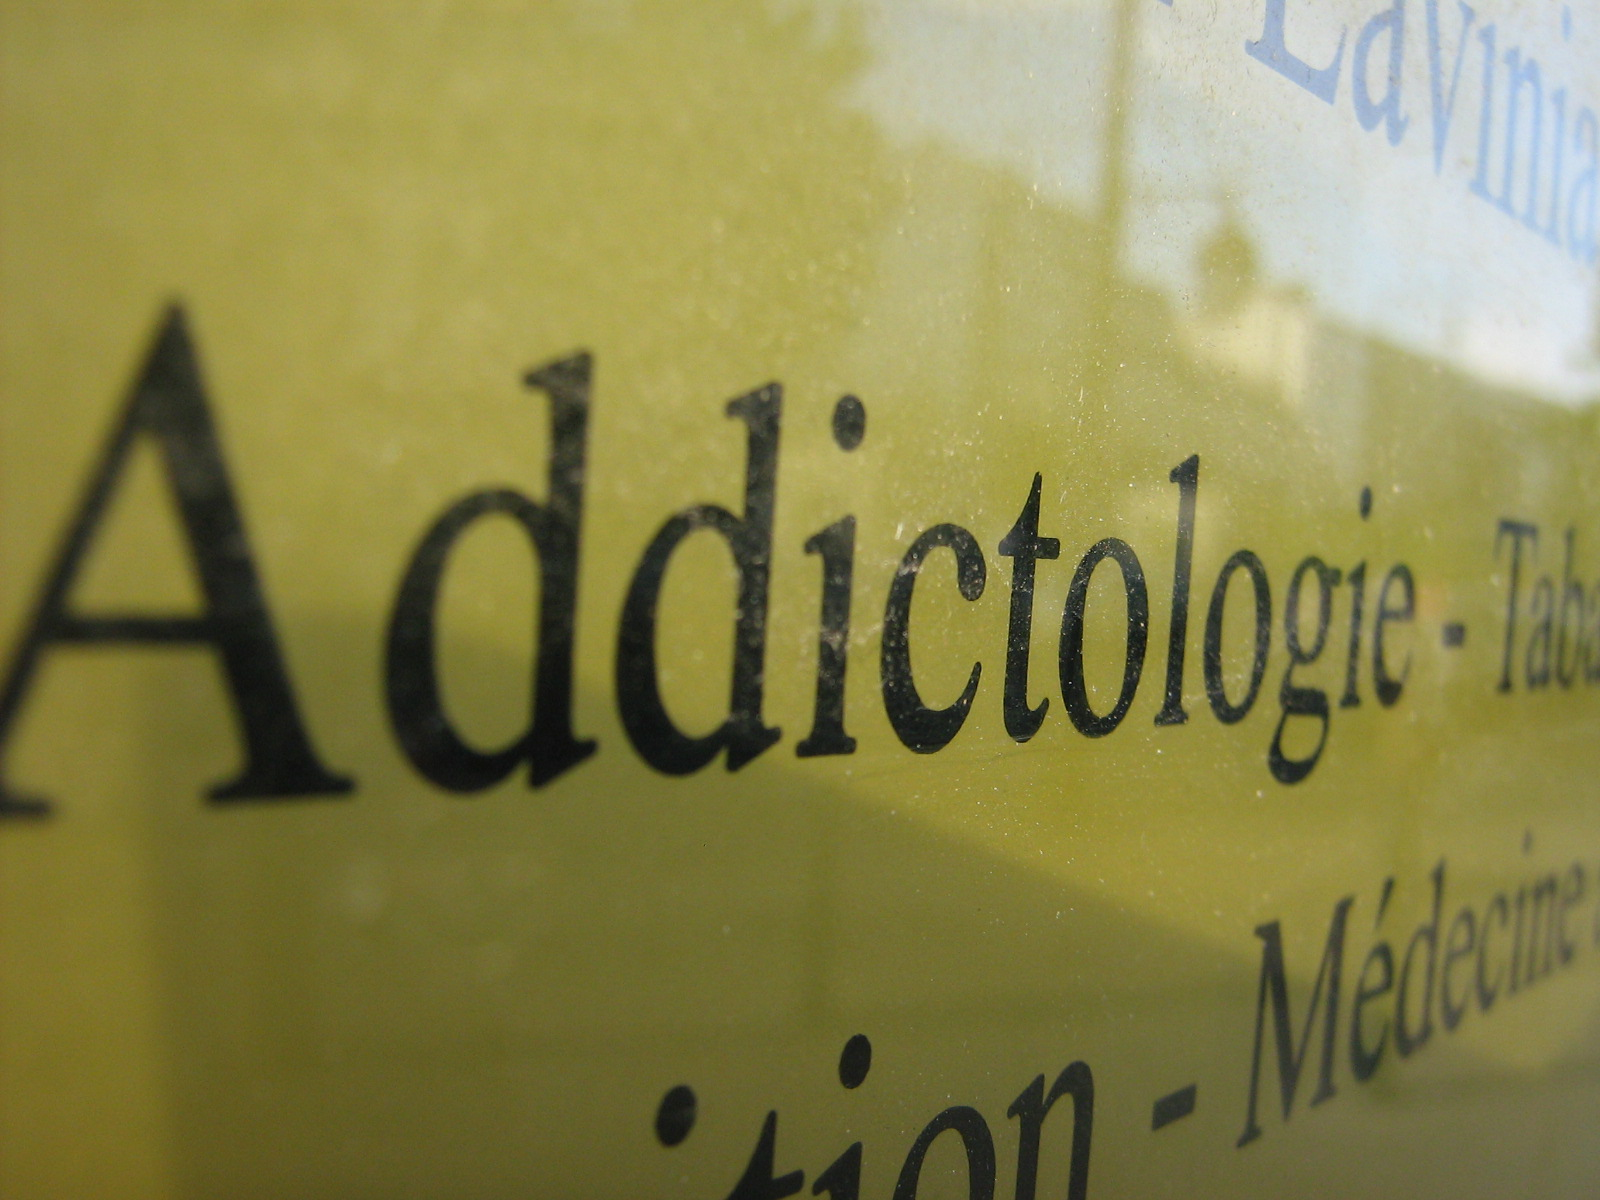 Addictologue